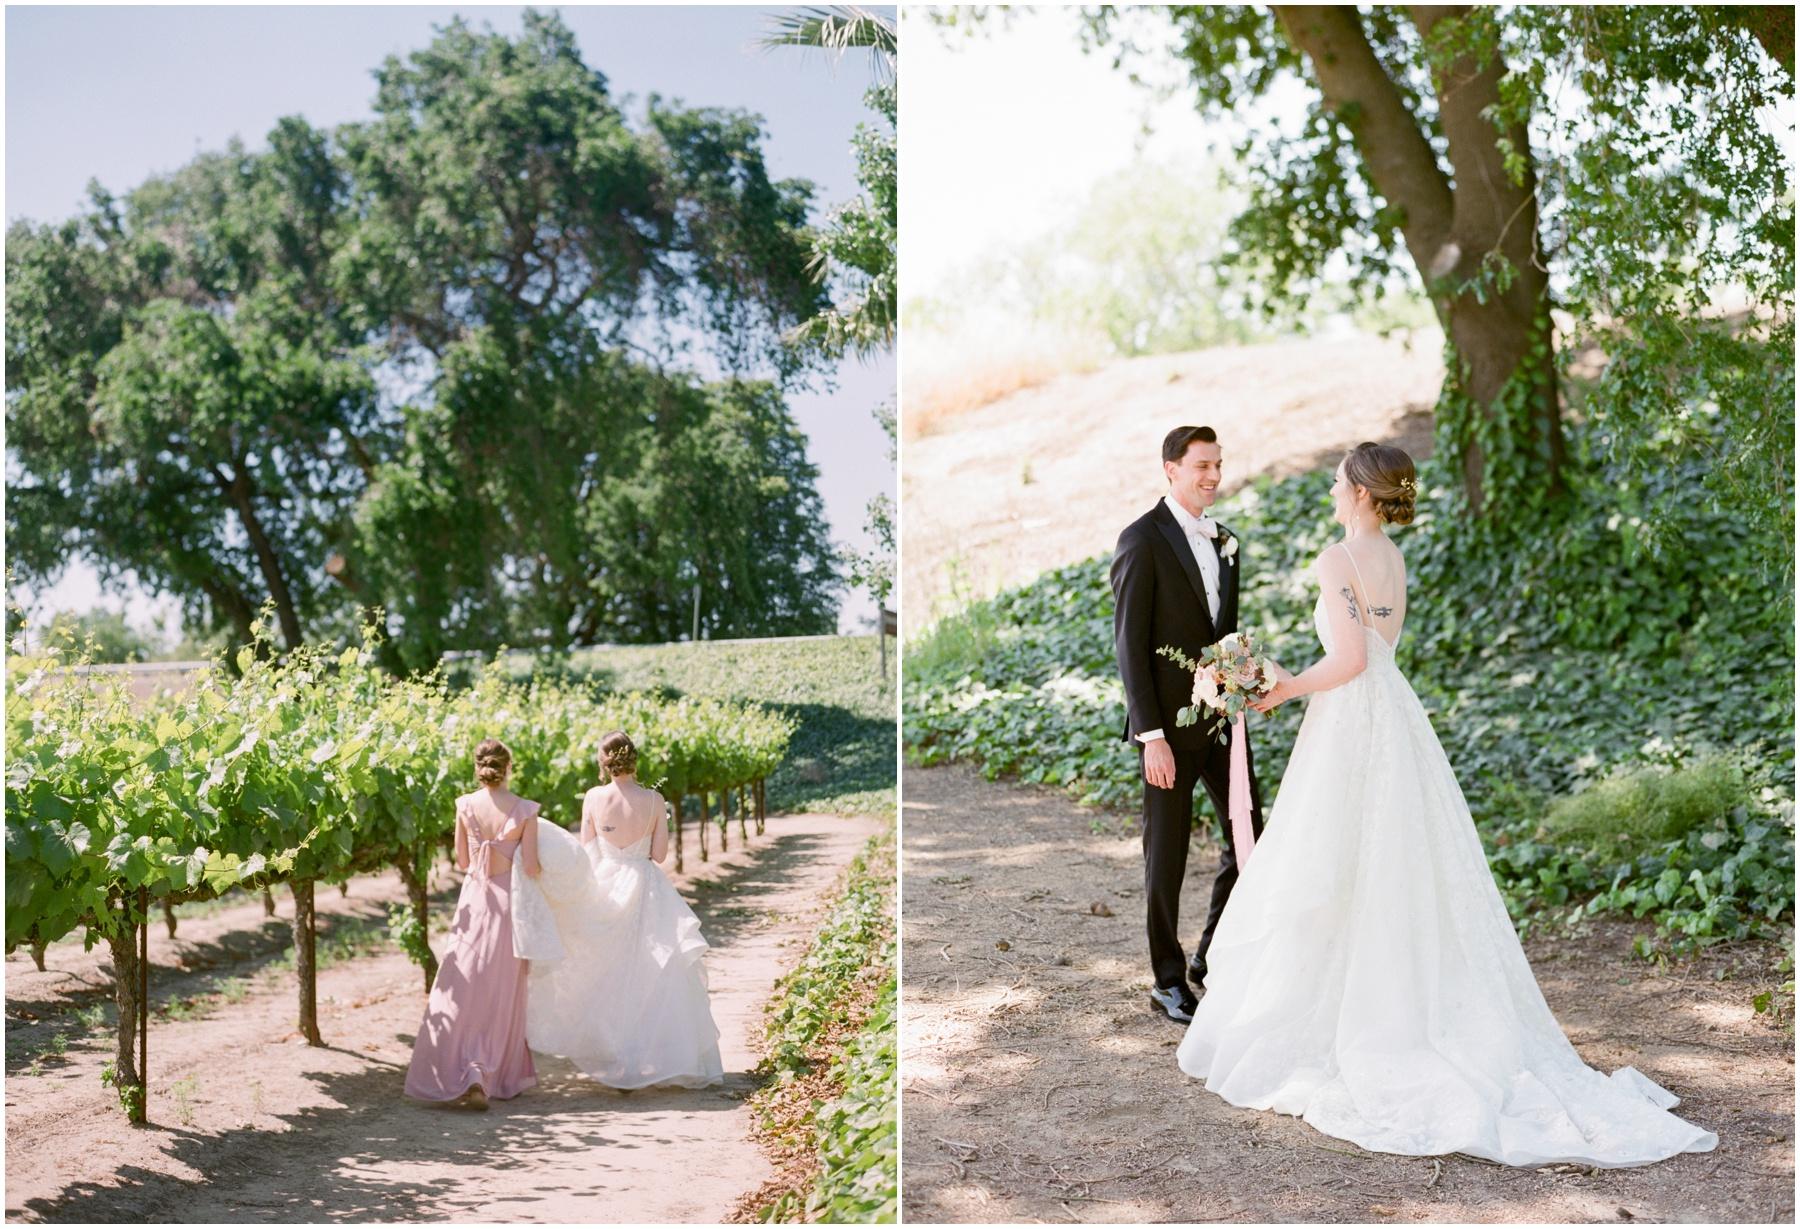 Scribner-bend-vineyards-wedding-sacramento-california-Kristine-Herman-Photography-73.jpg